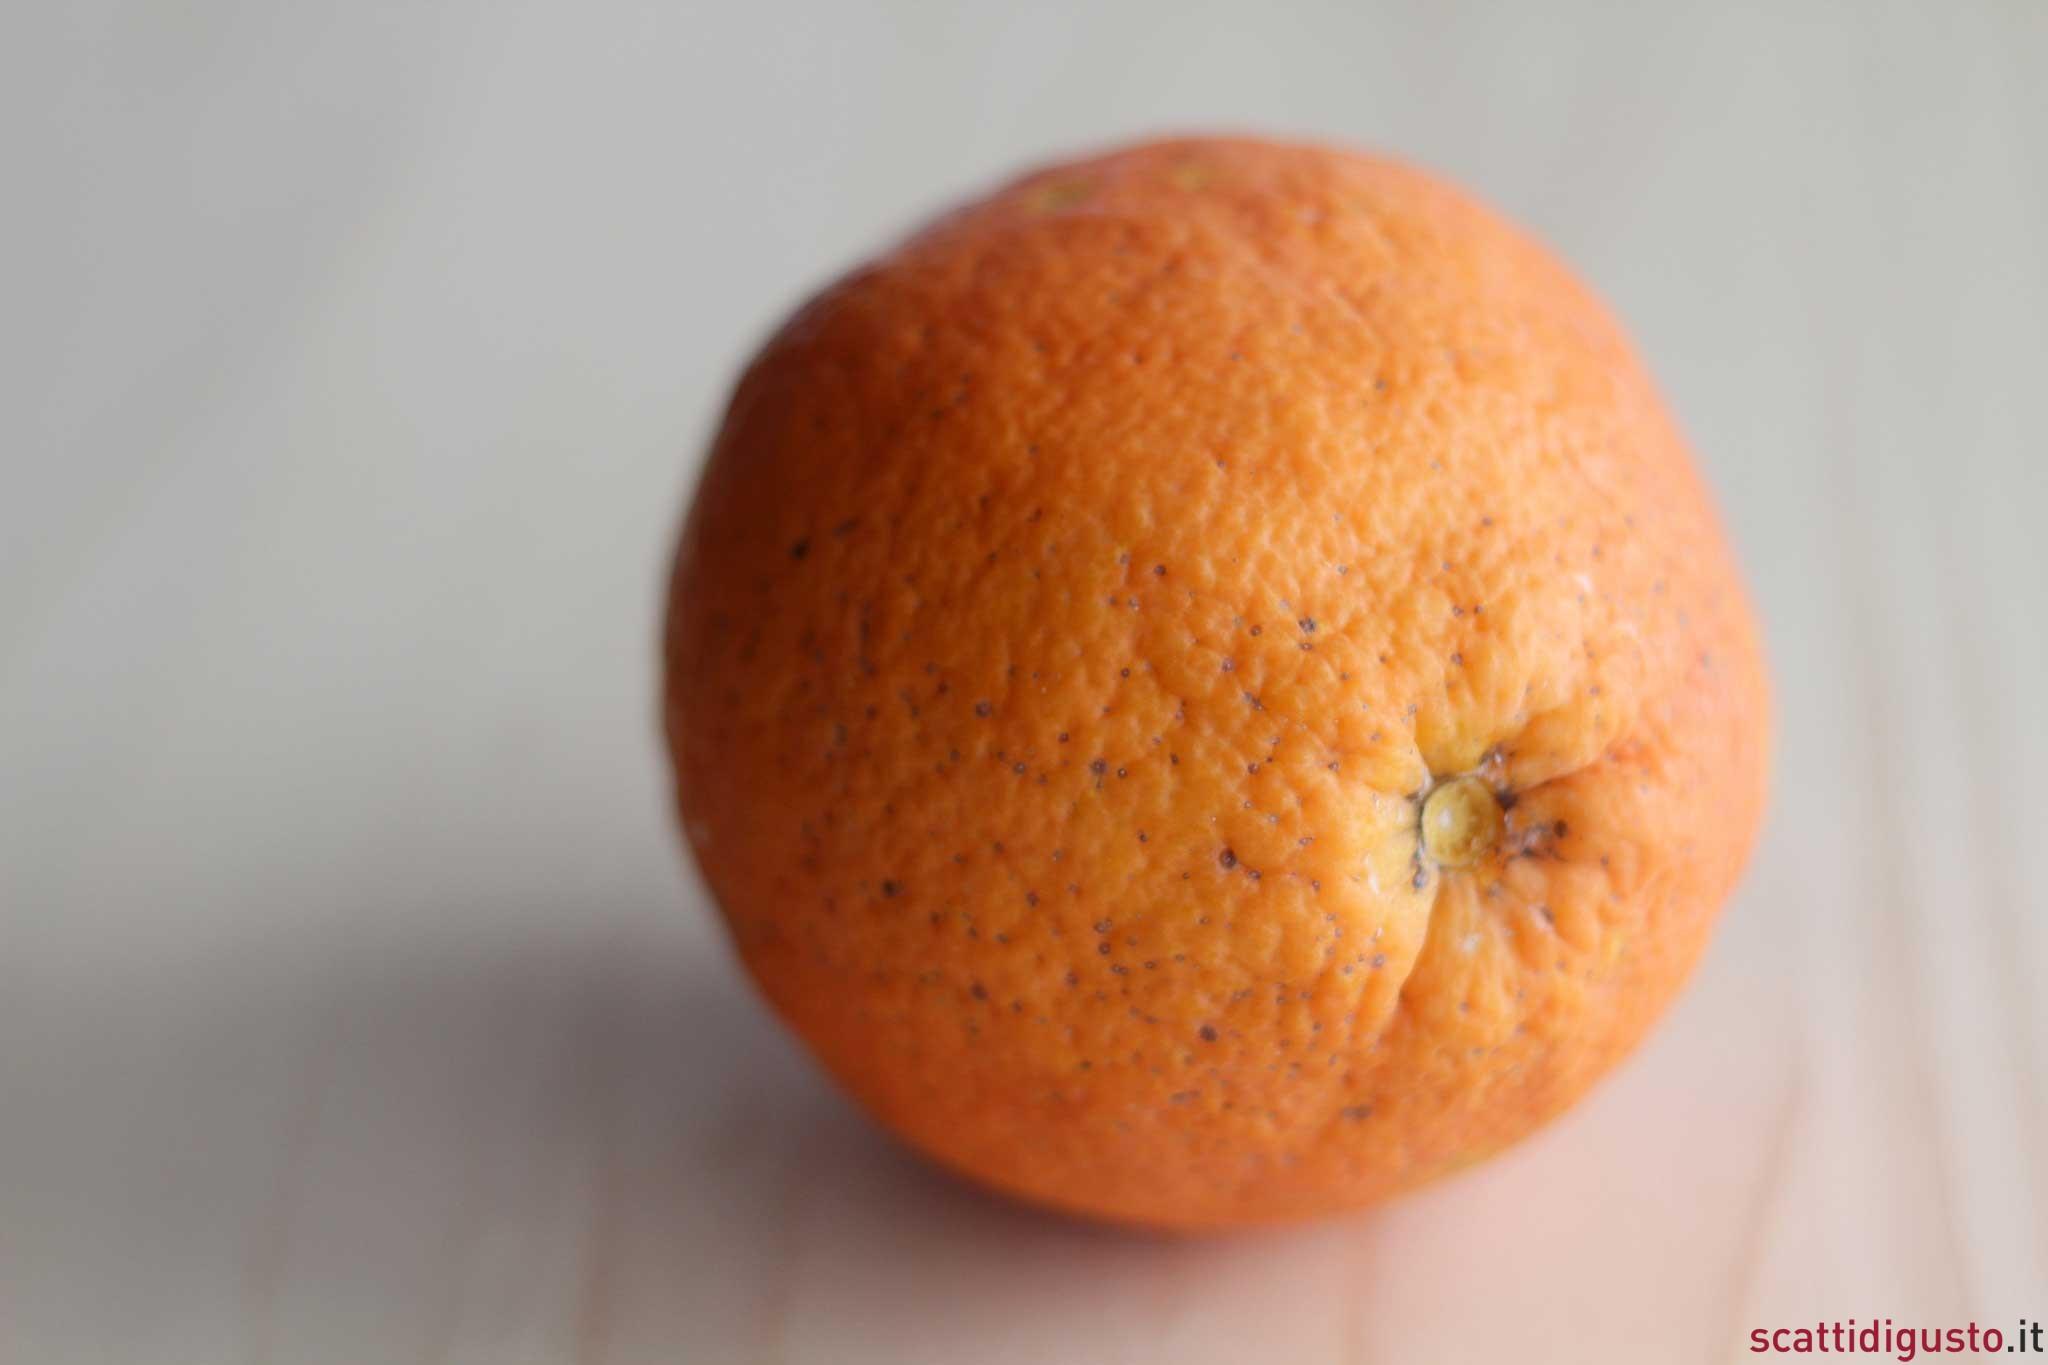 arancia zona arancione scuro